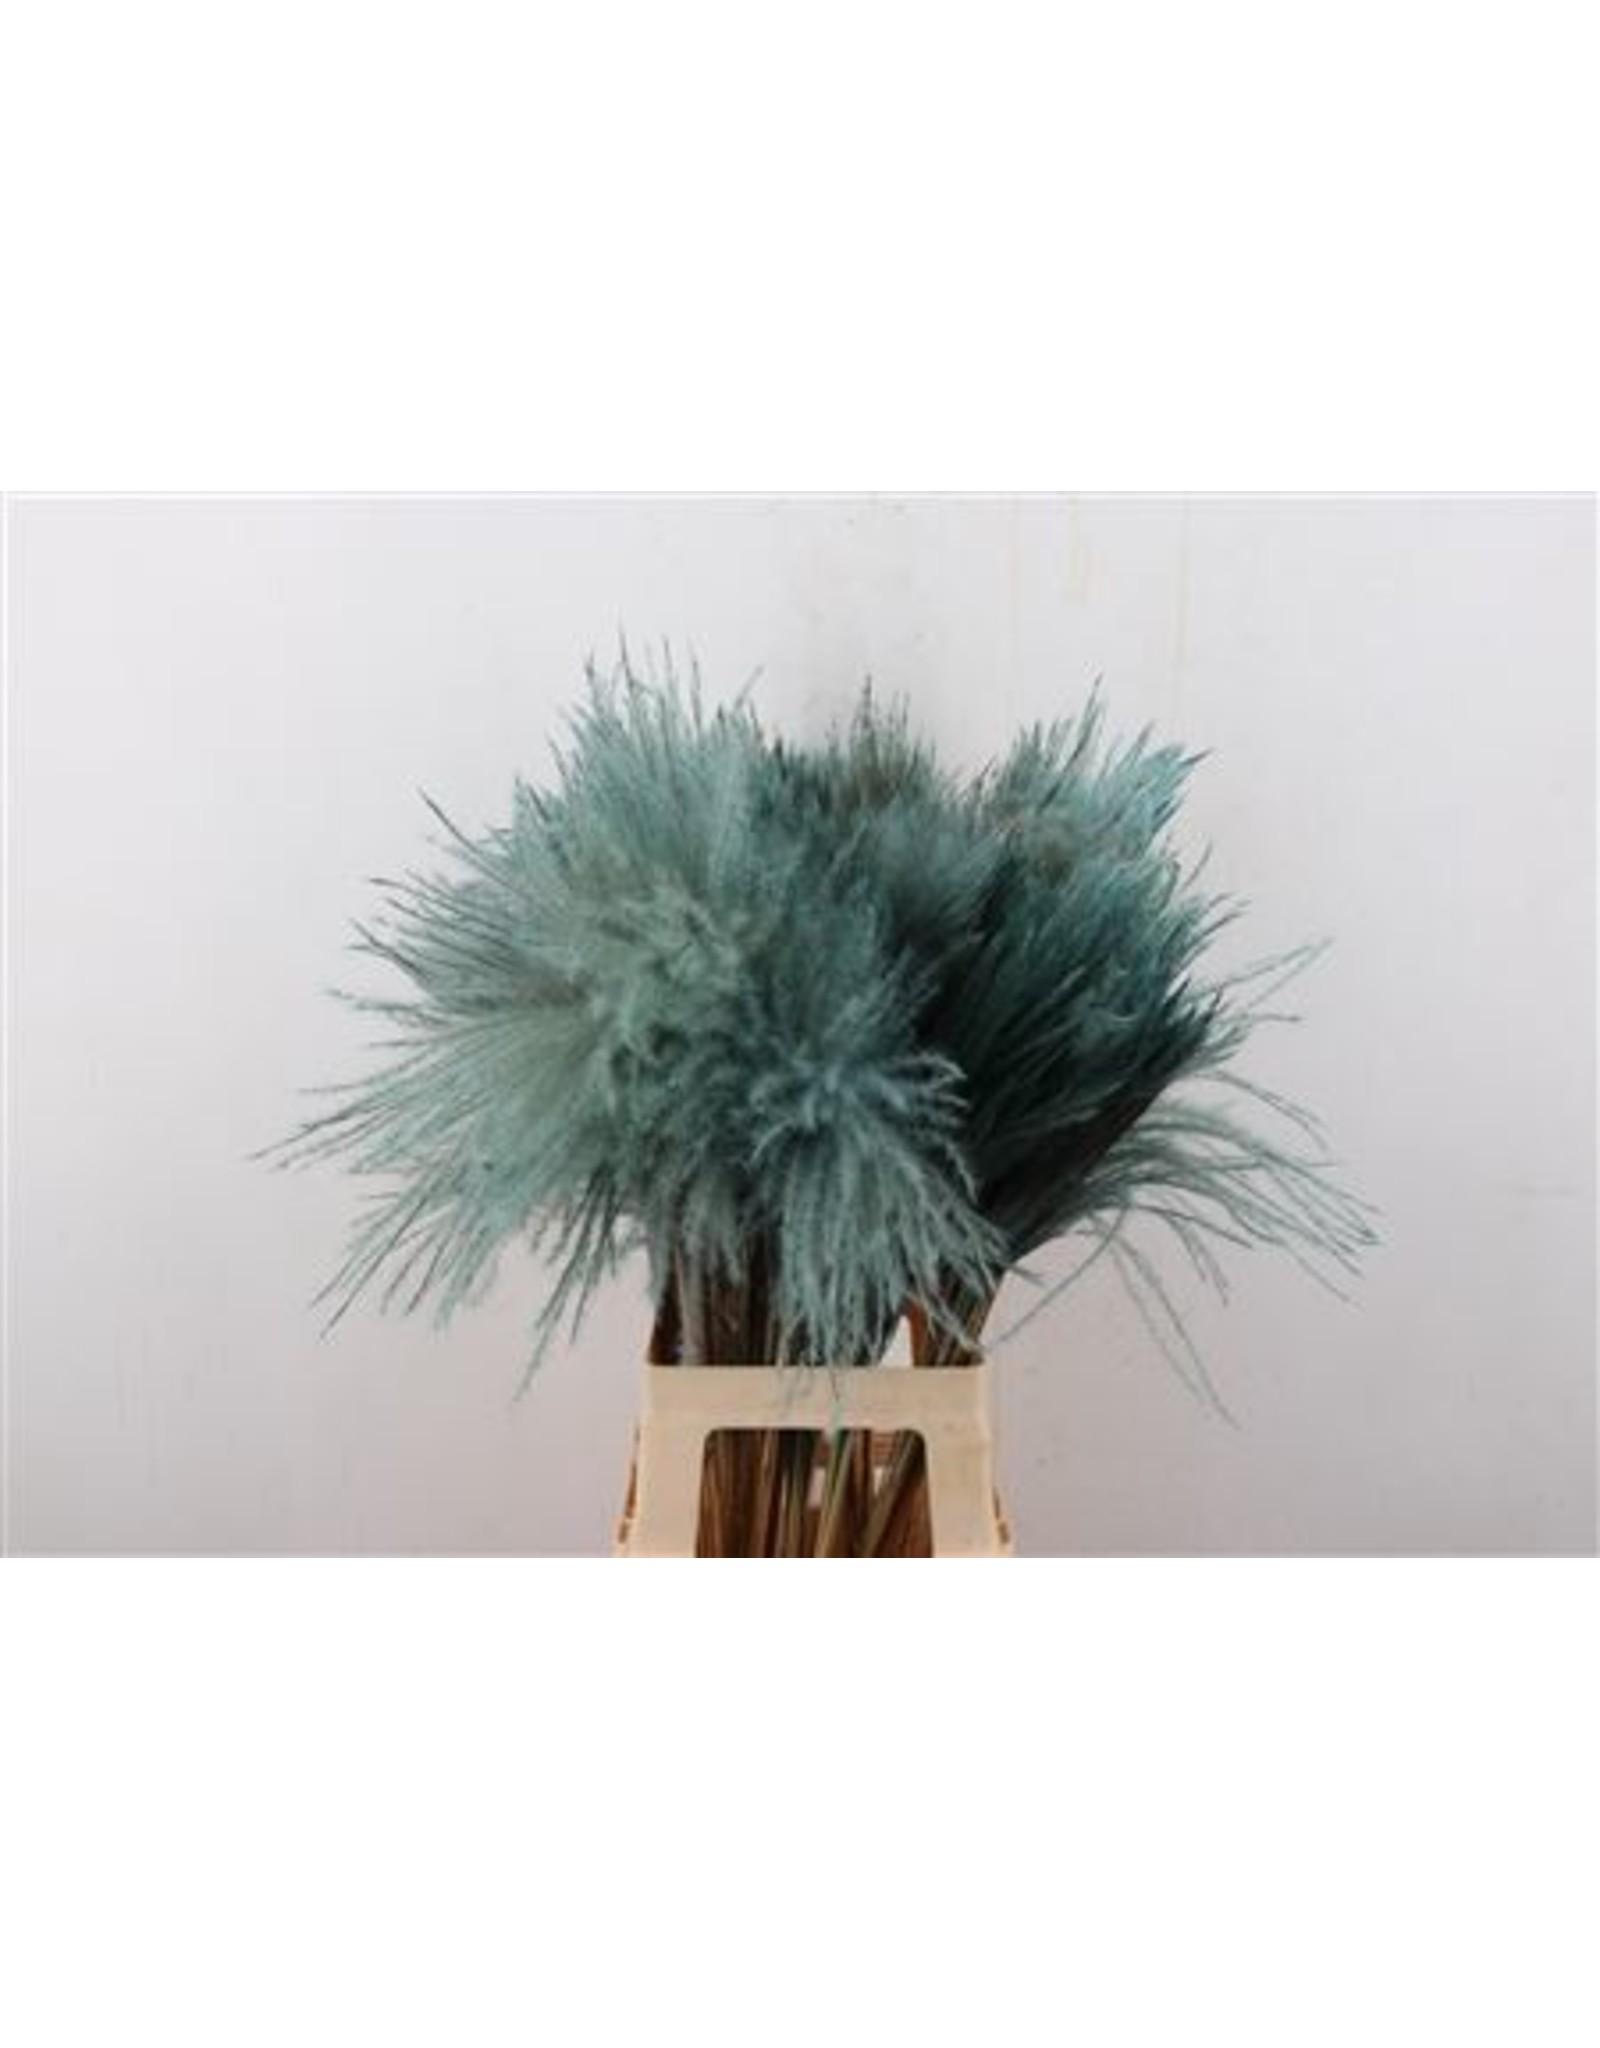 GF Dried Stipa Feather L. Blue P. Stem x 50